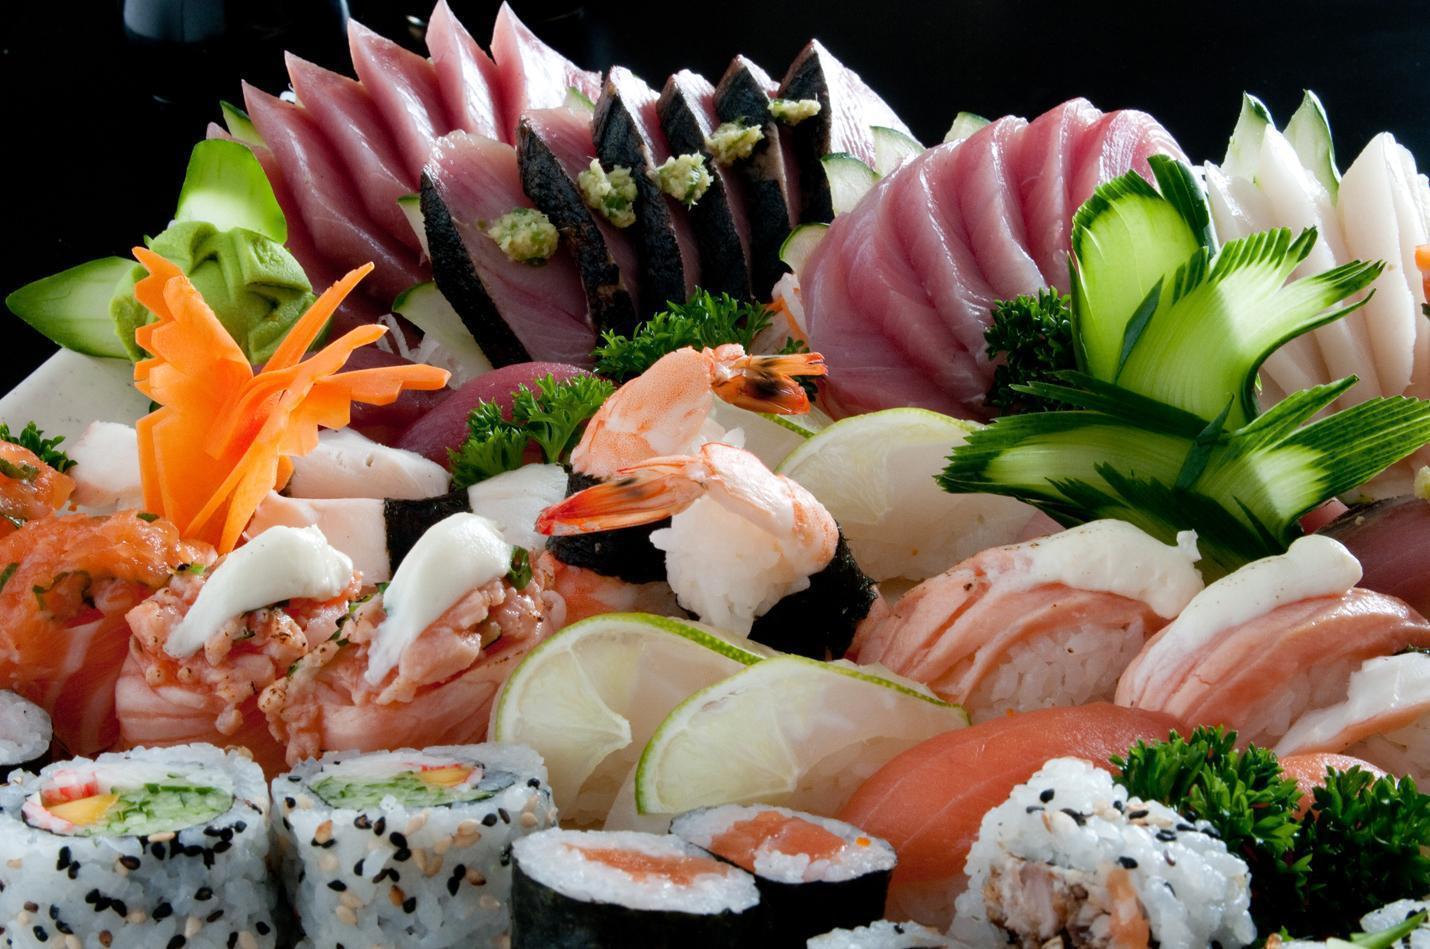 Dieta Japonesa: Como Funciona, Alimentos Permitidos e Benefícios